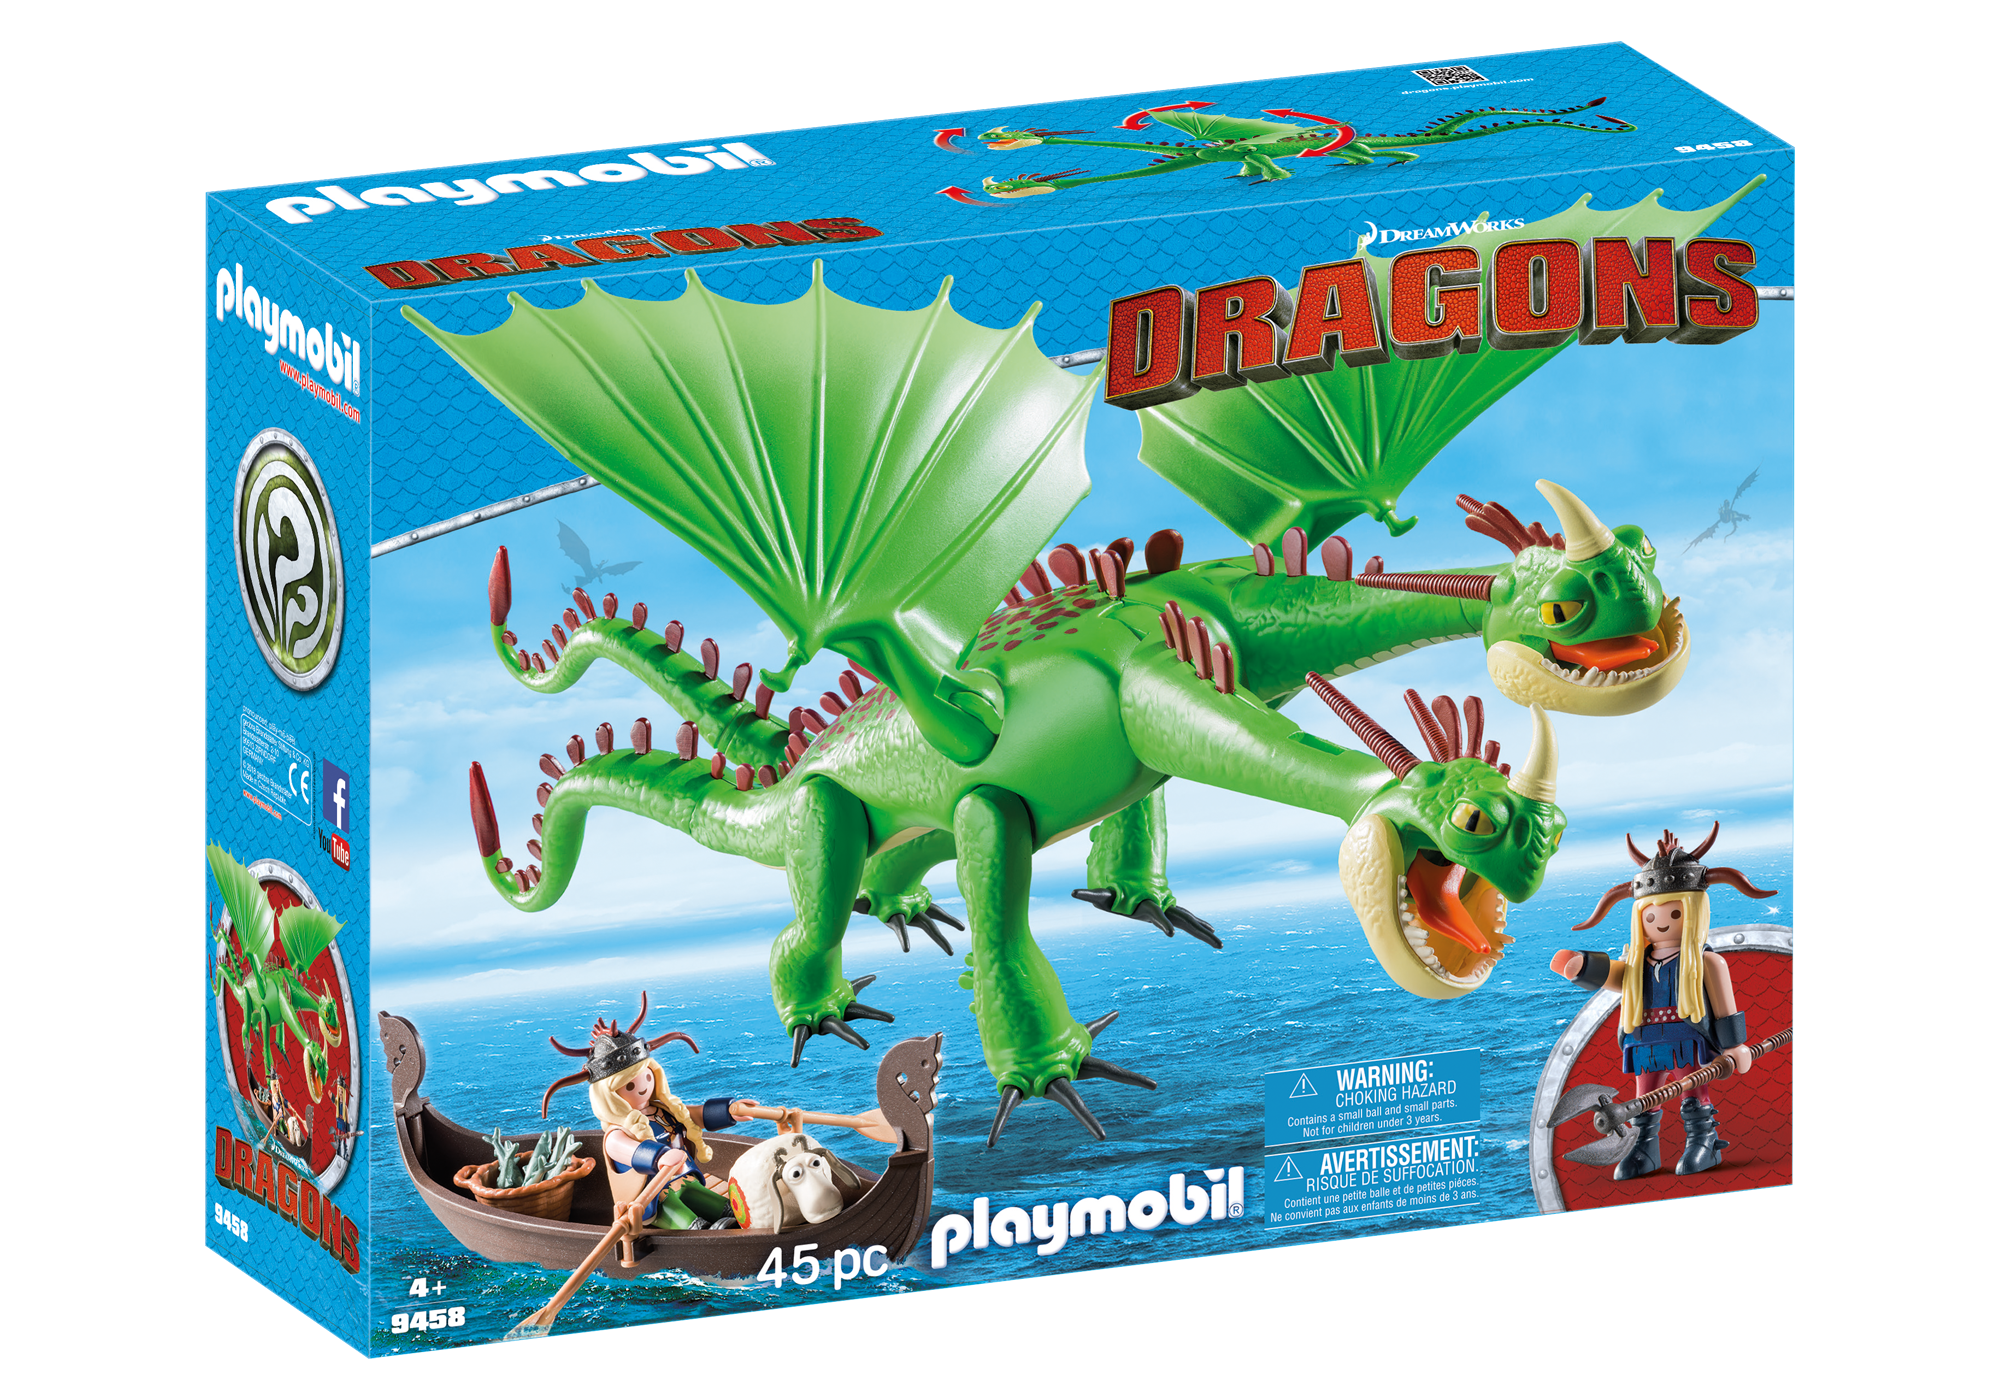 http://media.playmobil.com/i/playmobil/9458_product_box_front